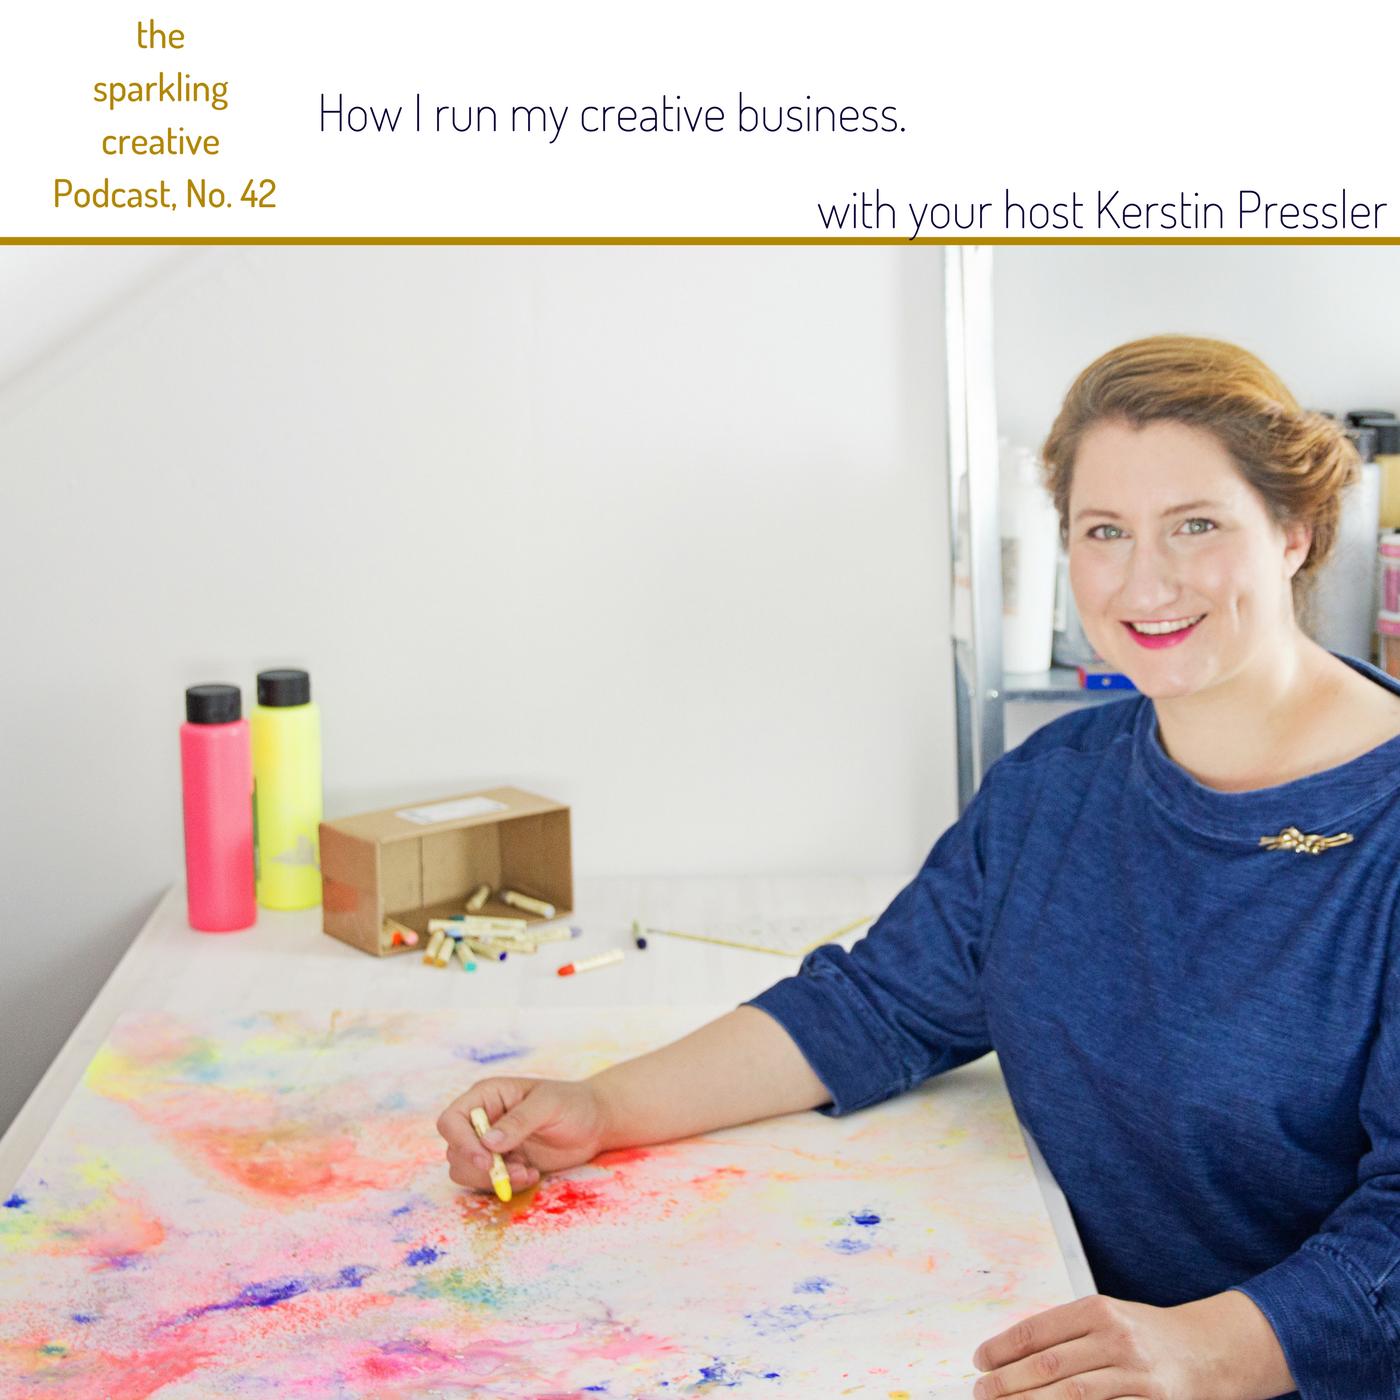 The sparkling creative Podcast, Episode 42, How I run my creative business. Kerstin Pressler. www.kerstinpressler.com/blog-2/episode42